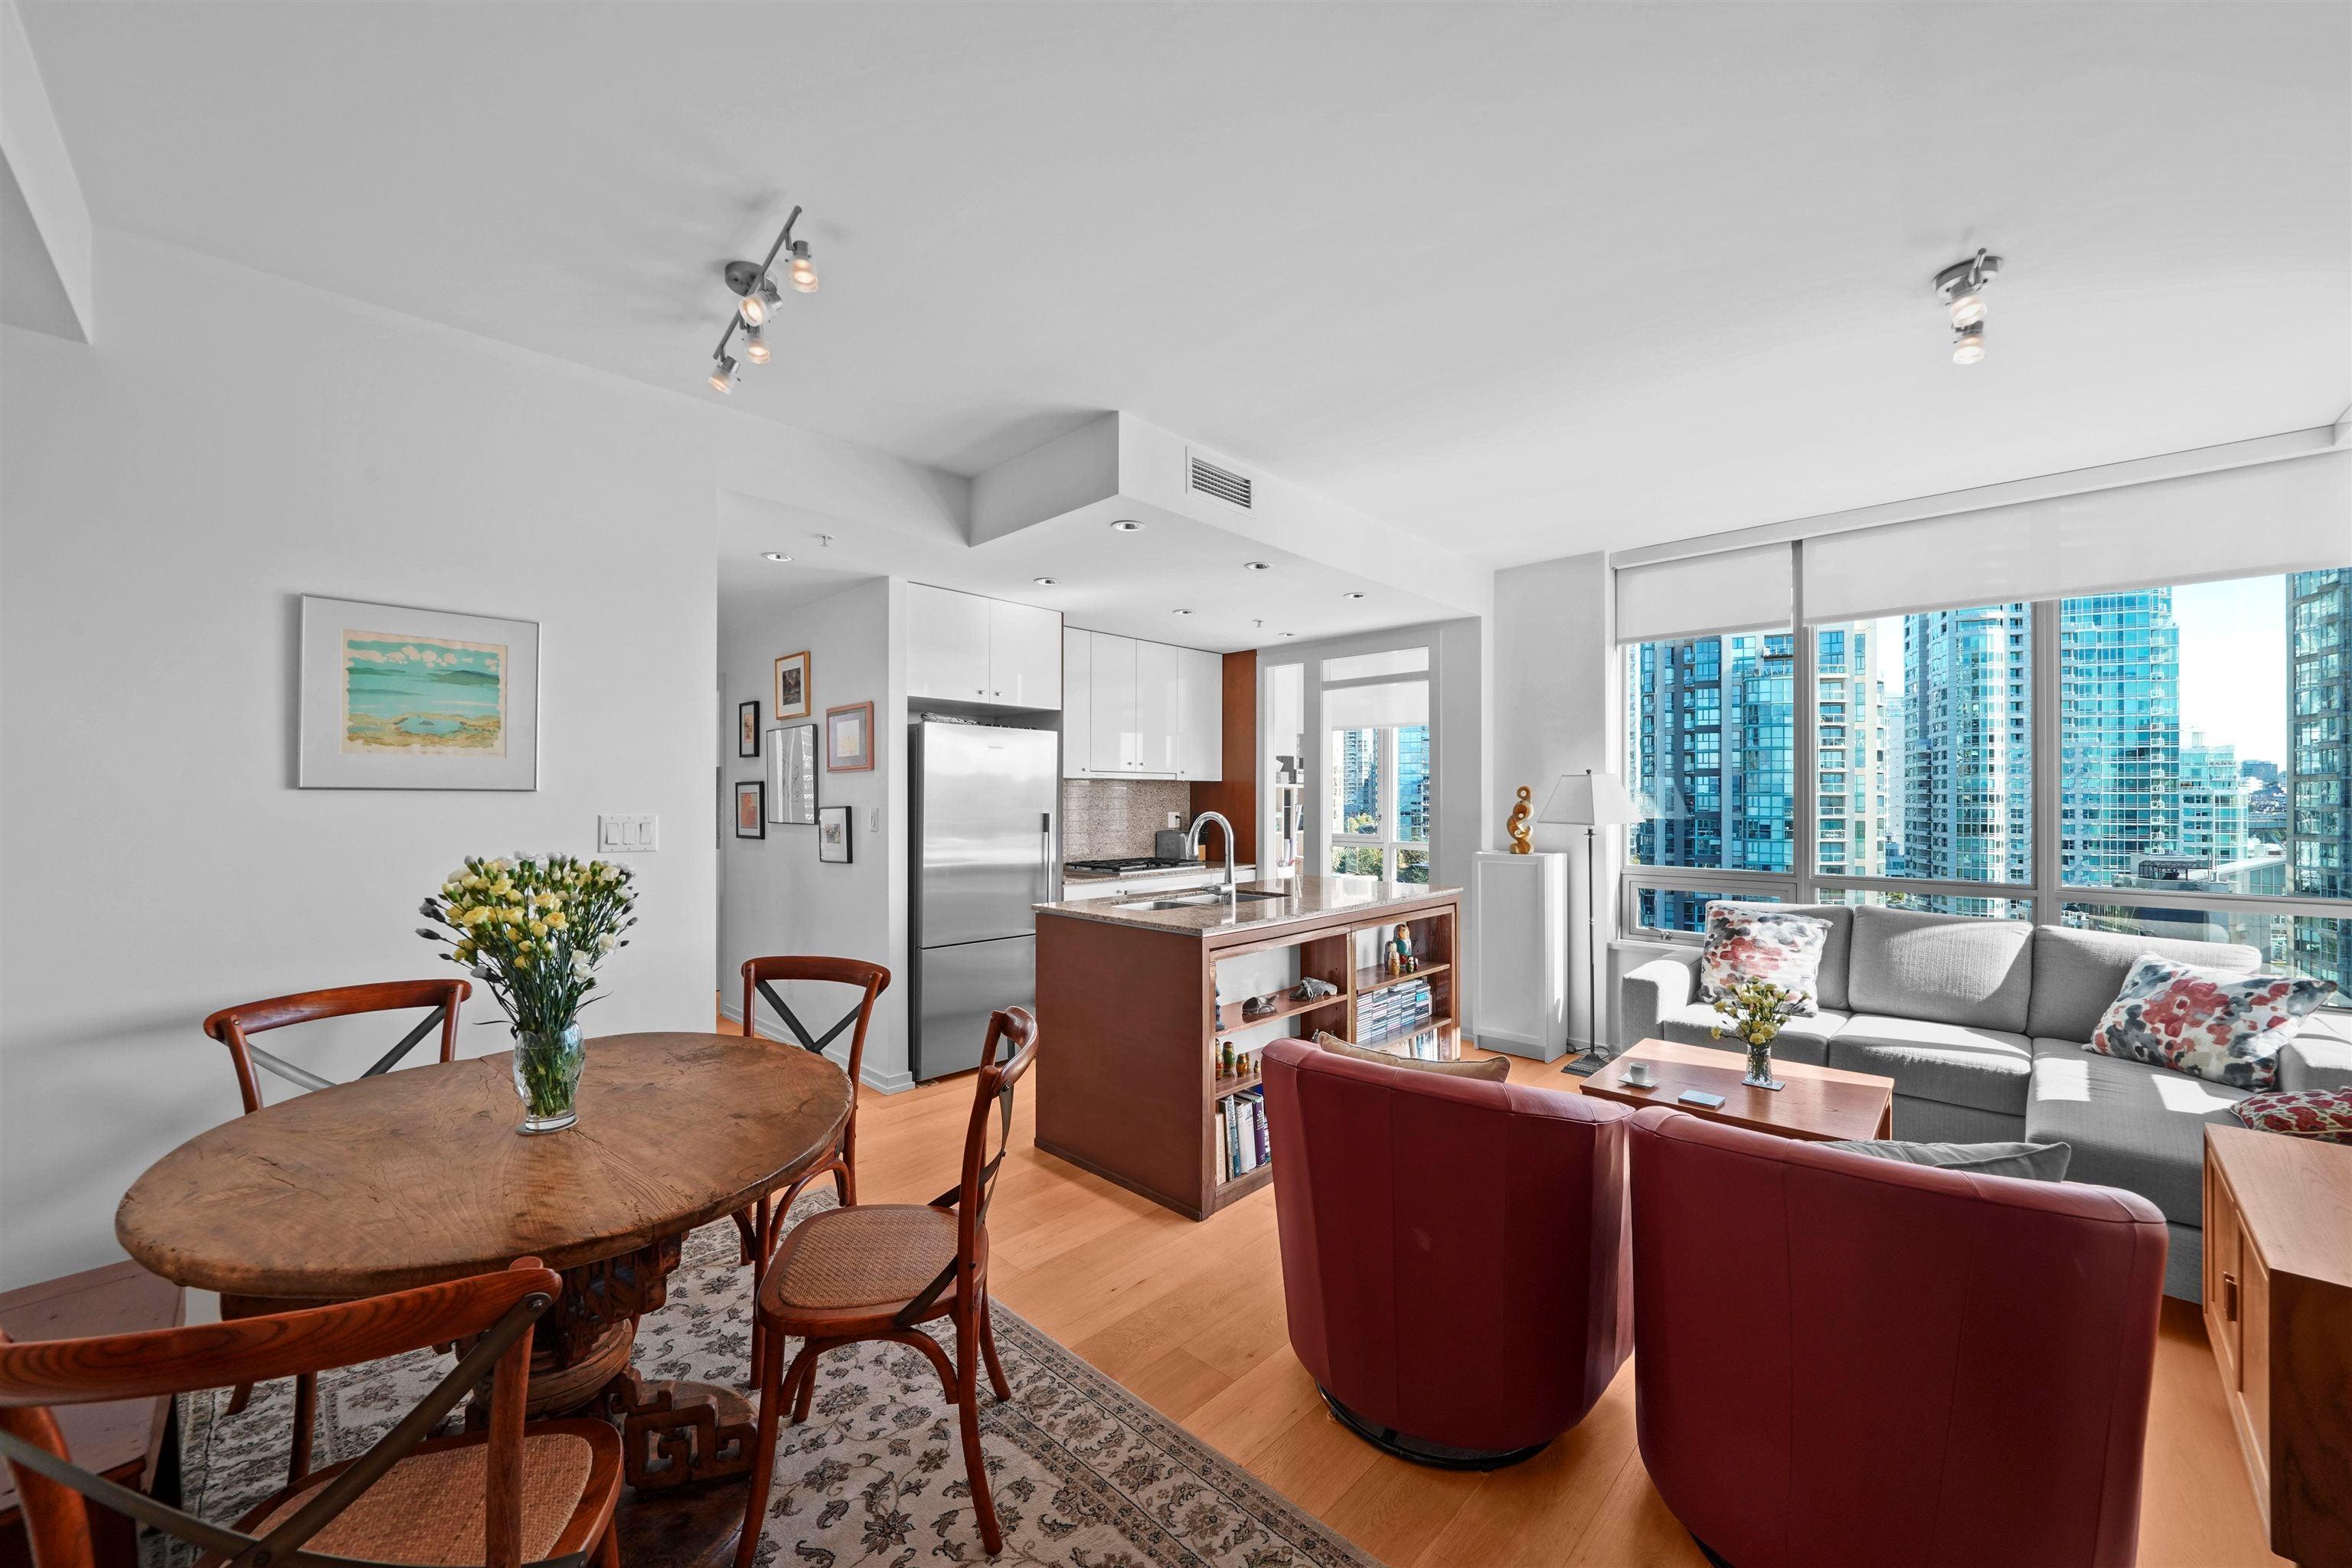 1201 1005 BEACH AVENUE - West End VW Apartment/Condo for sale, 1 Bedroom (R2618722) - #1